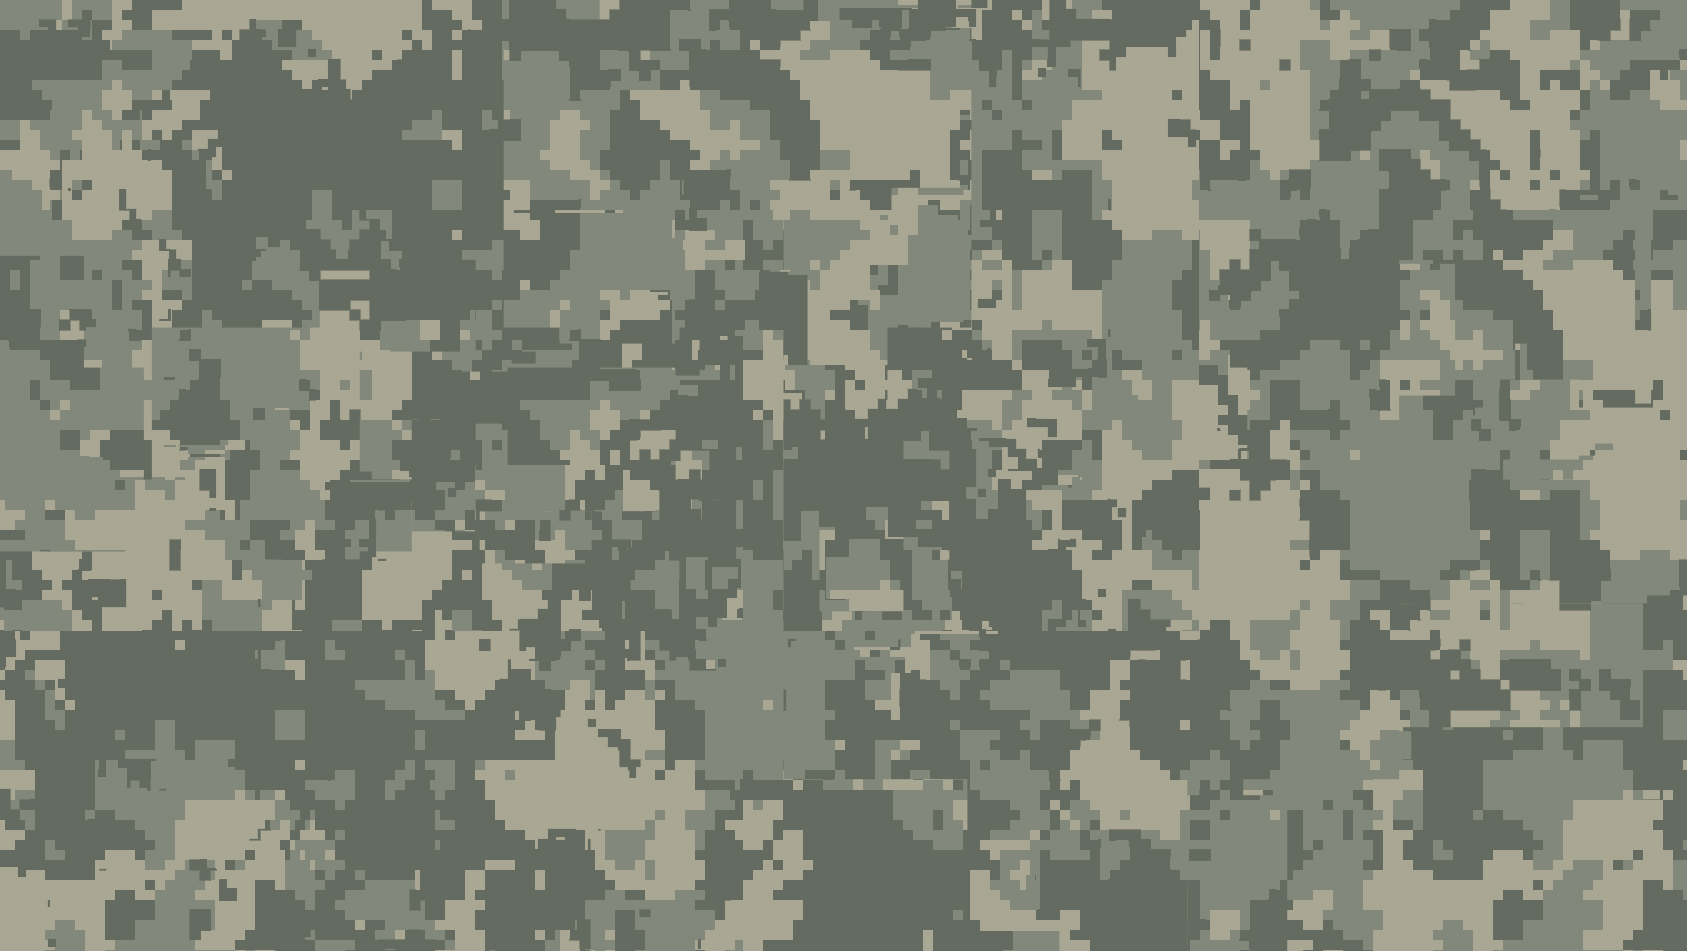 mossy oak wallpaper for iphone